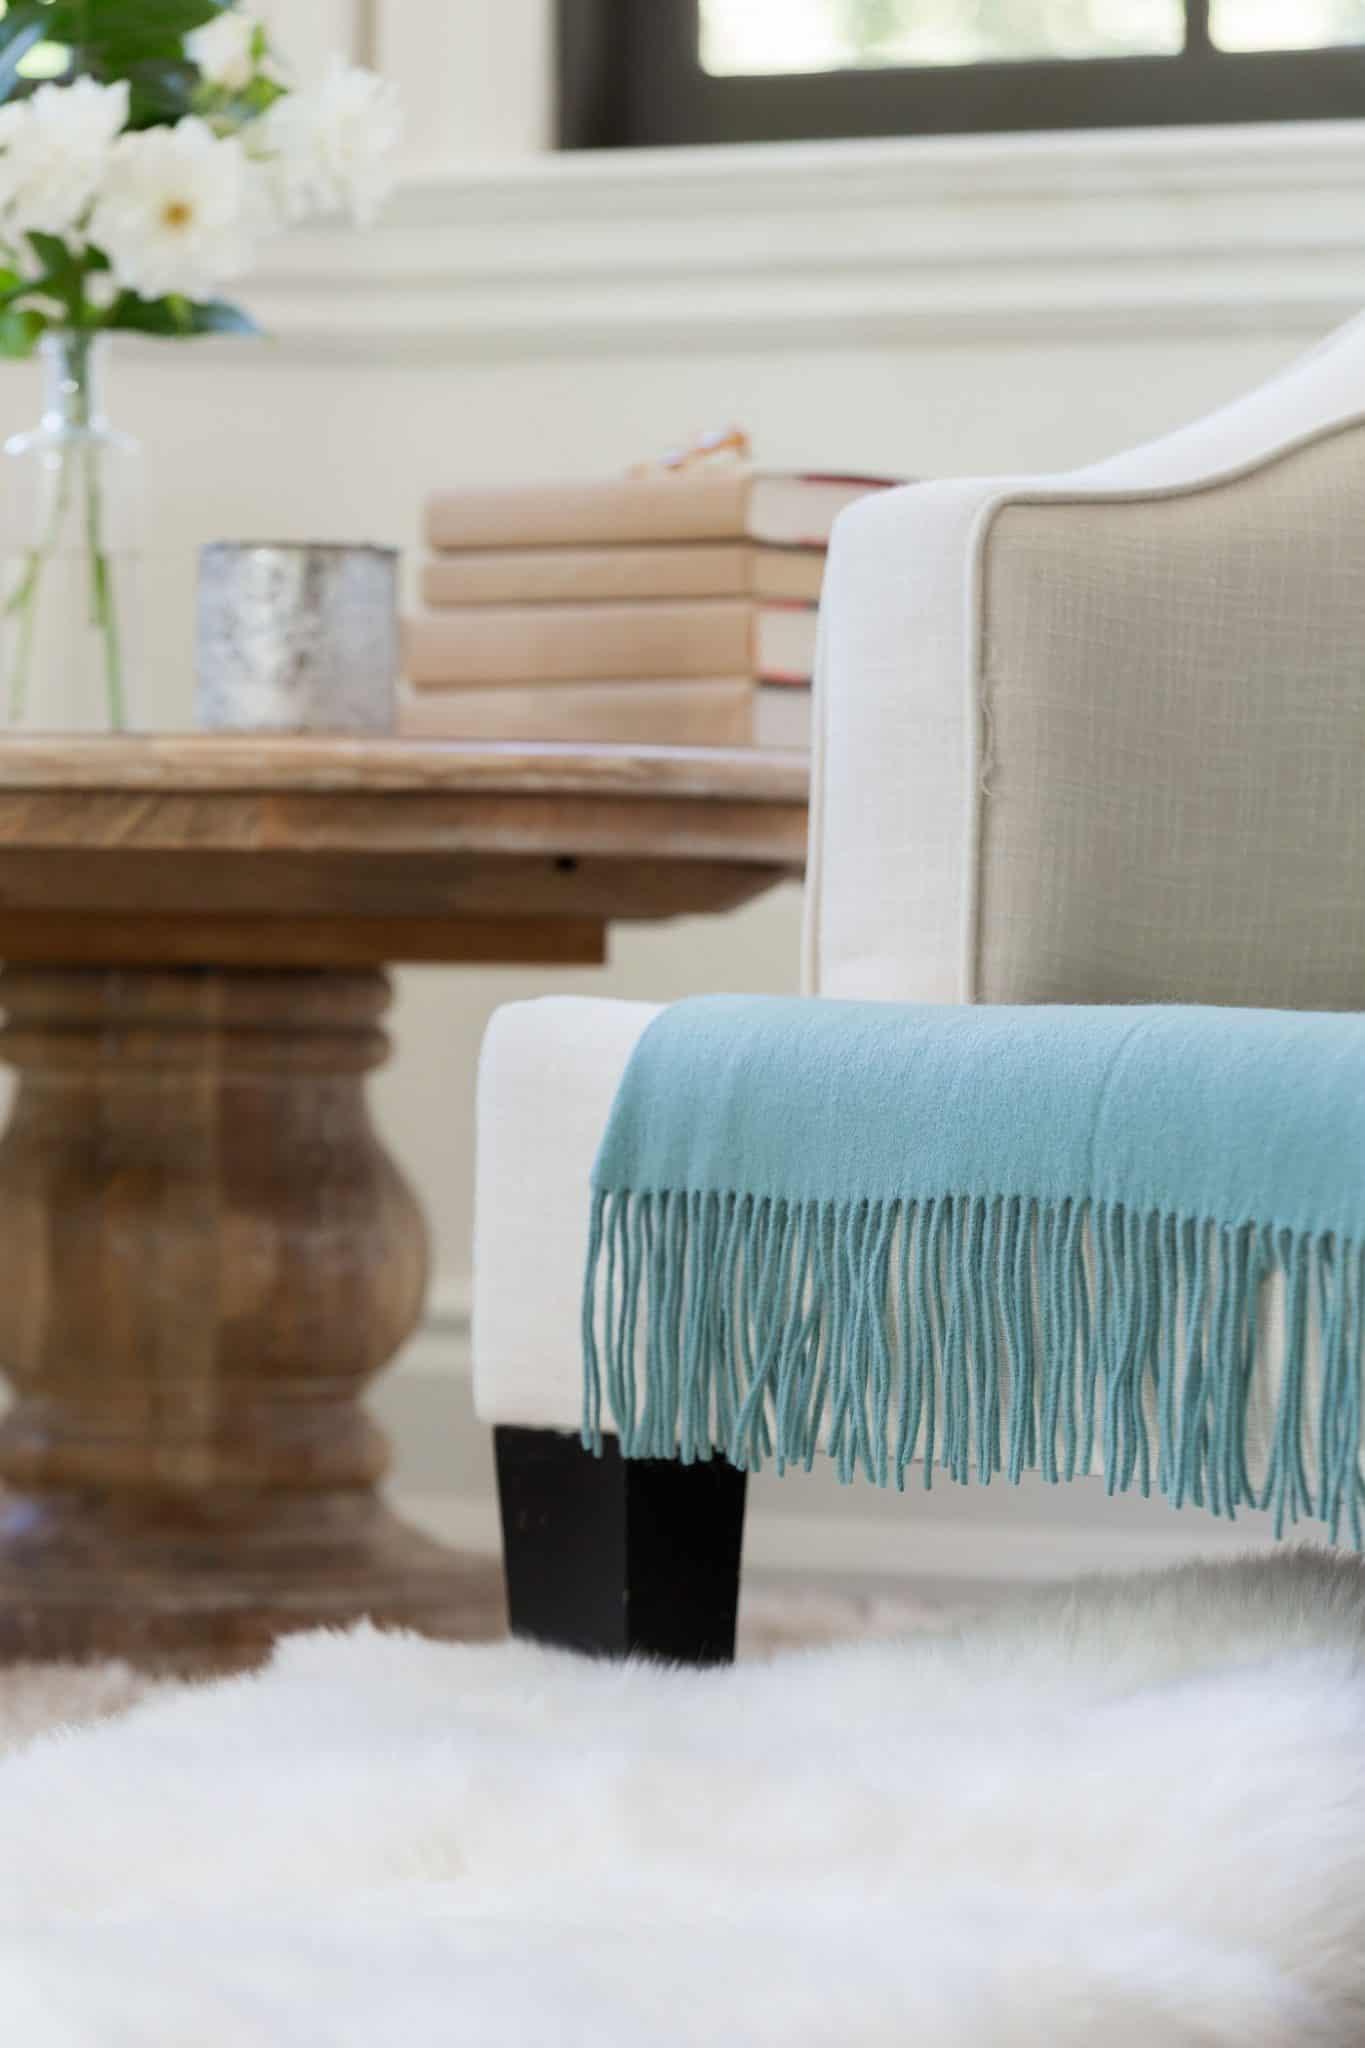 interior design ideas, decorating ideas, arm chair - My Style Vita @mystylevita